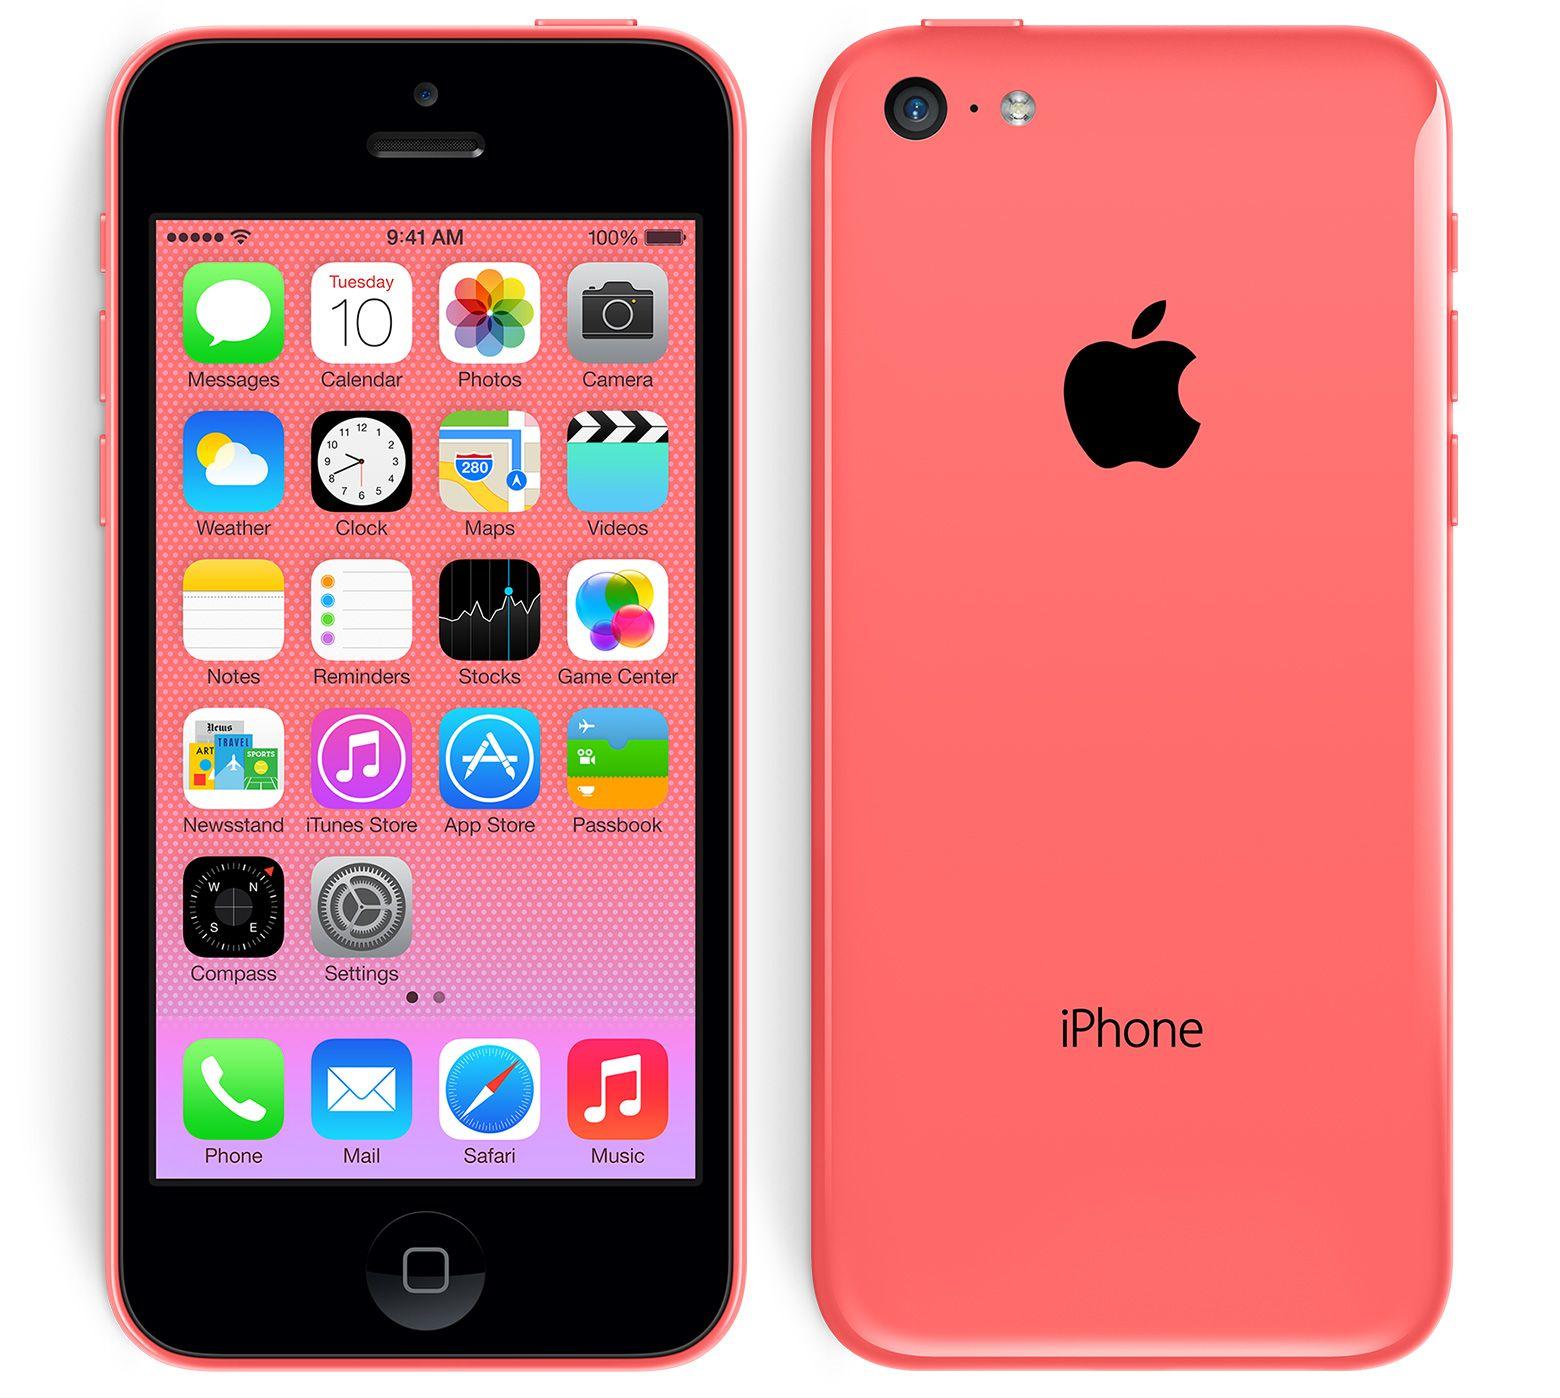 Www etradesupply com media uploaded iphone 5c vs iphone 5 screen jpg - Visit Http Pdomazin Ecrater Com For The Newset Iphone 5